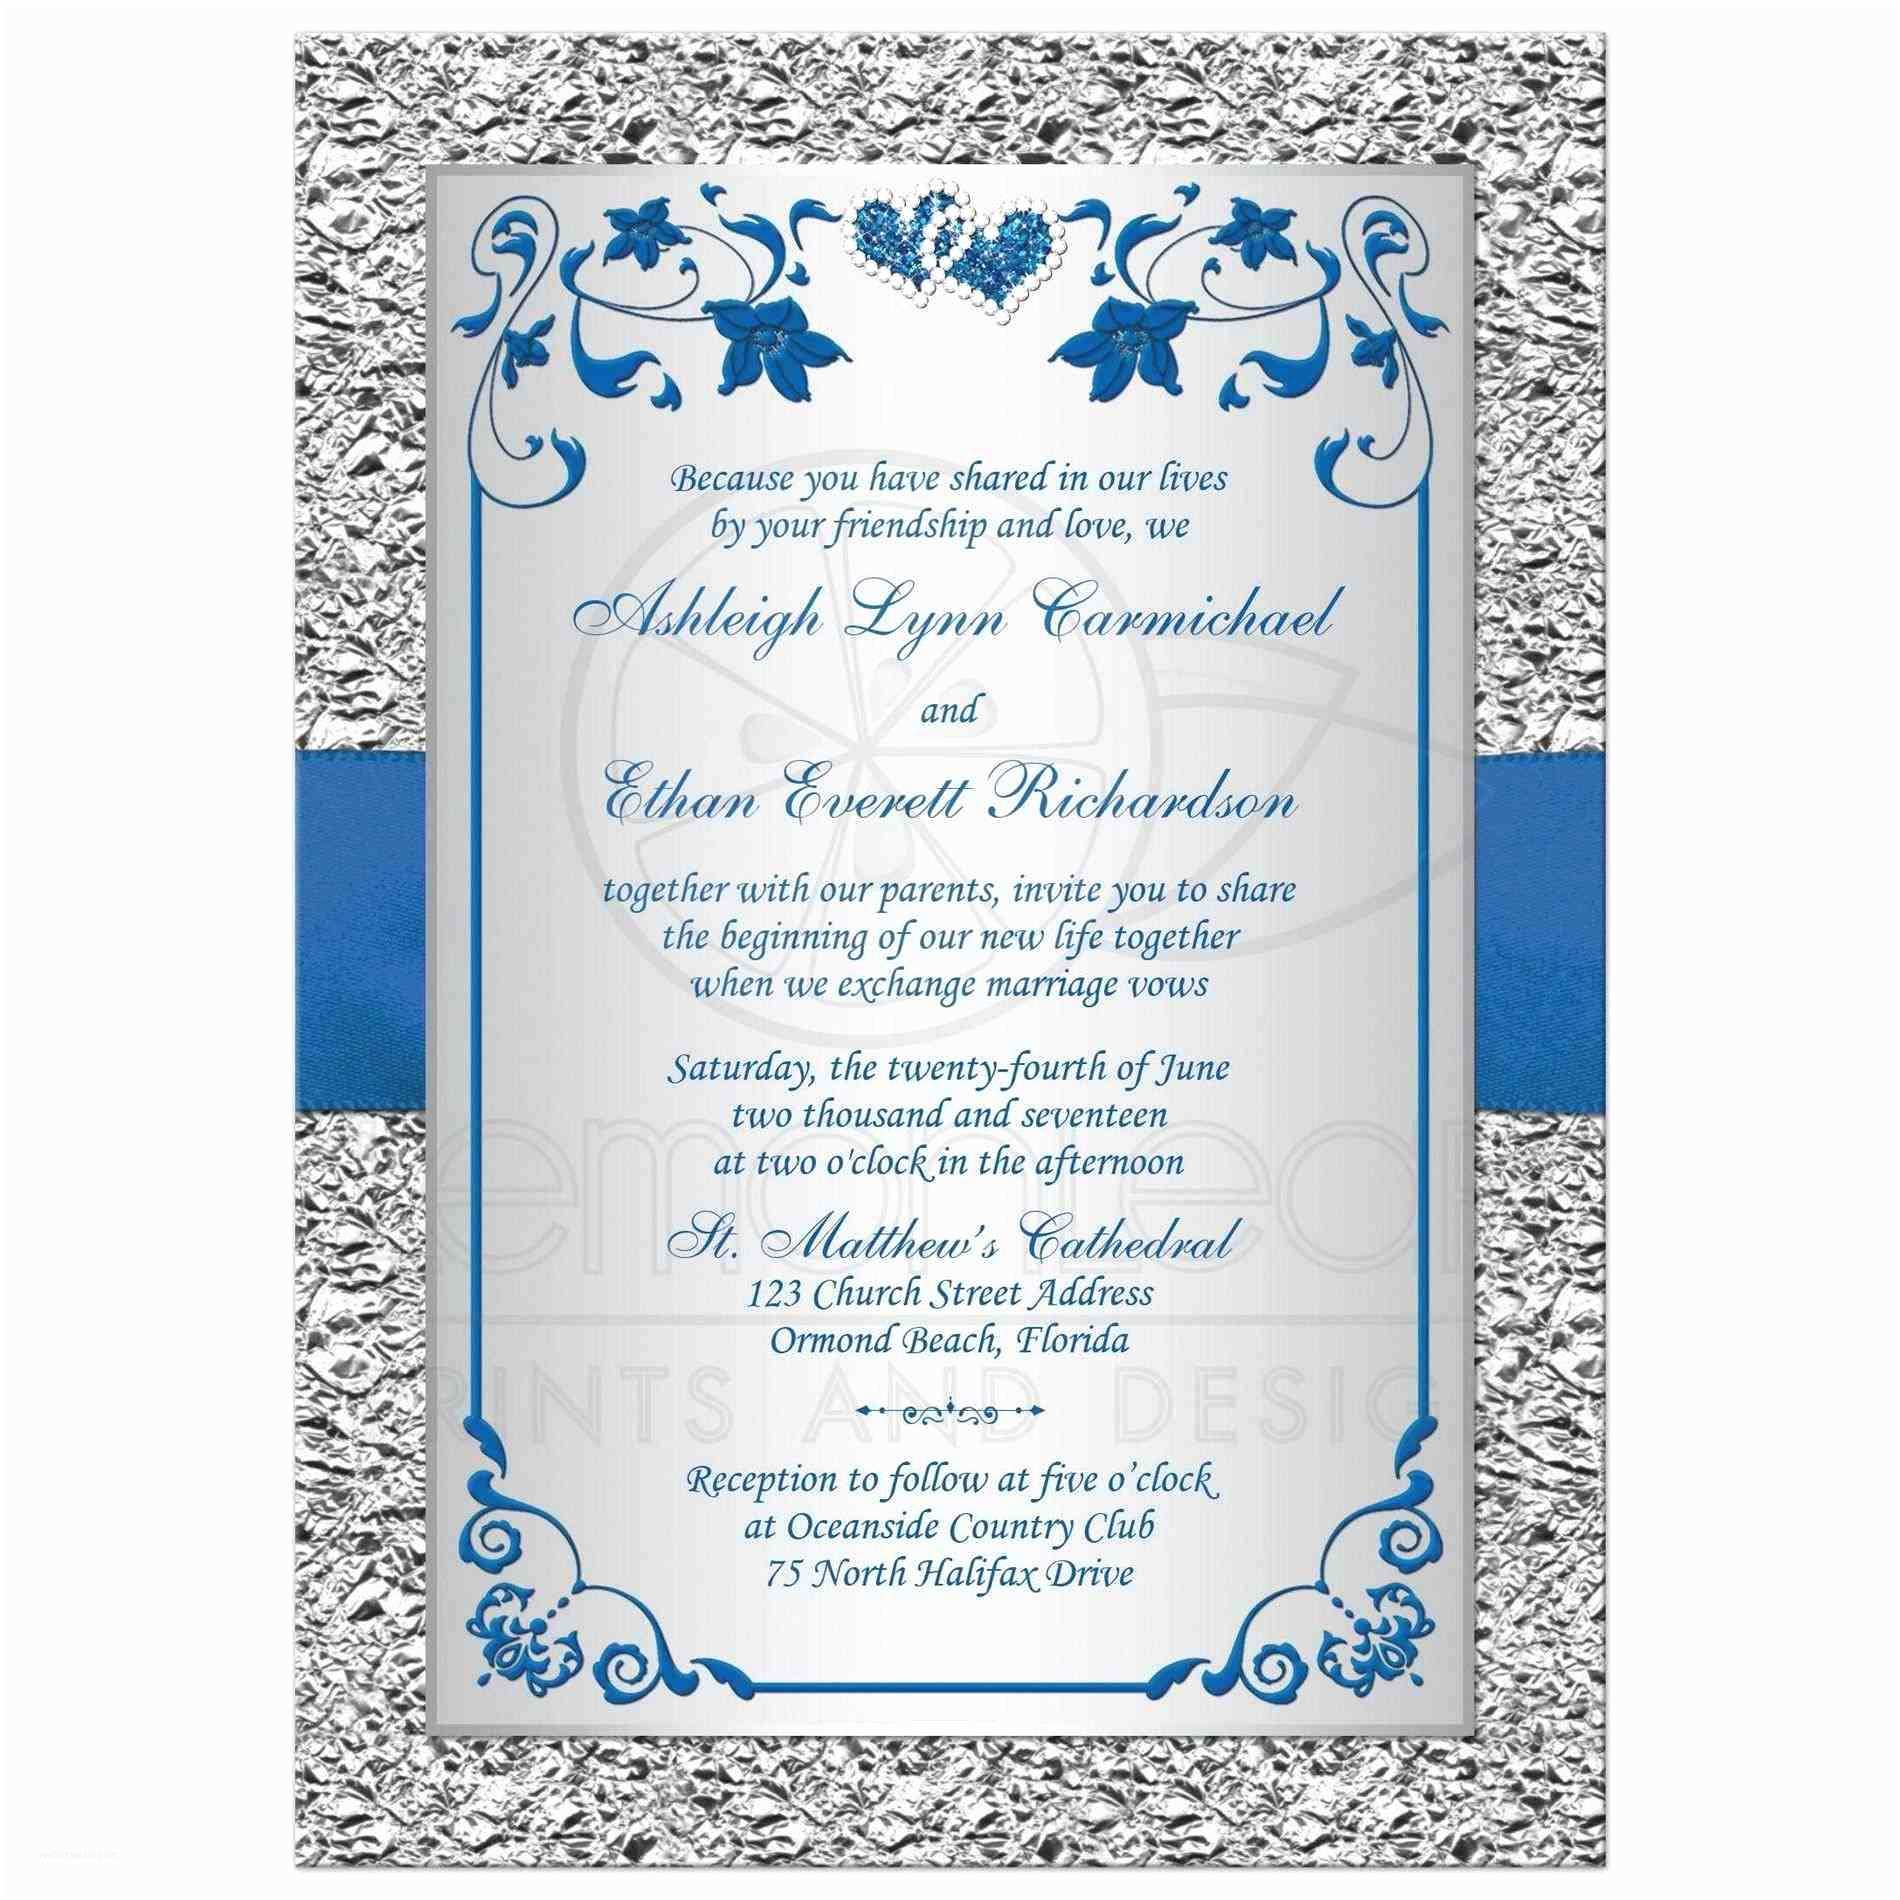 Silver Wedding Invitations Templates Royal Blue and Silver Wedding Invitations